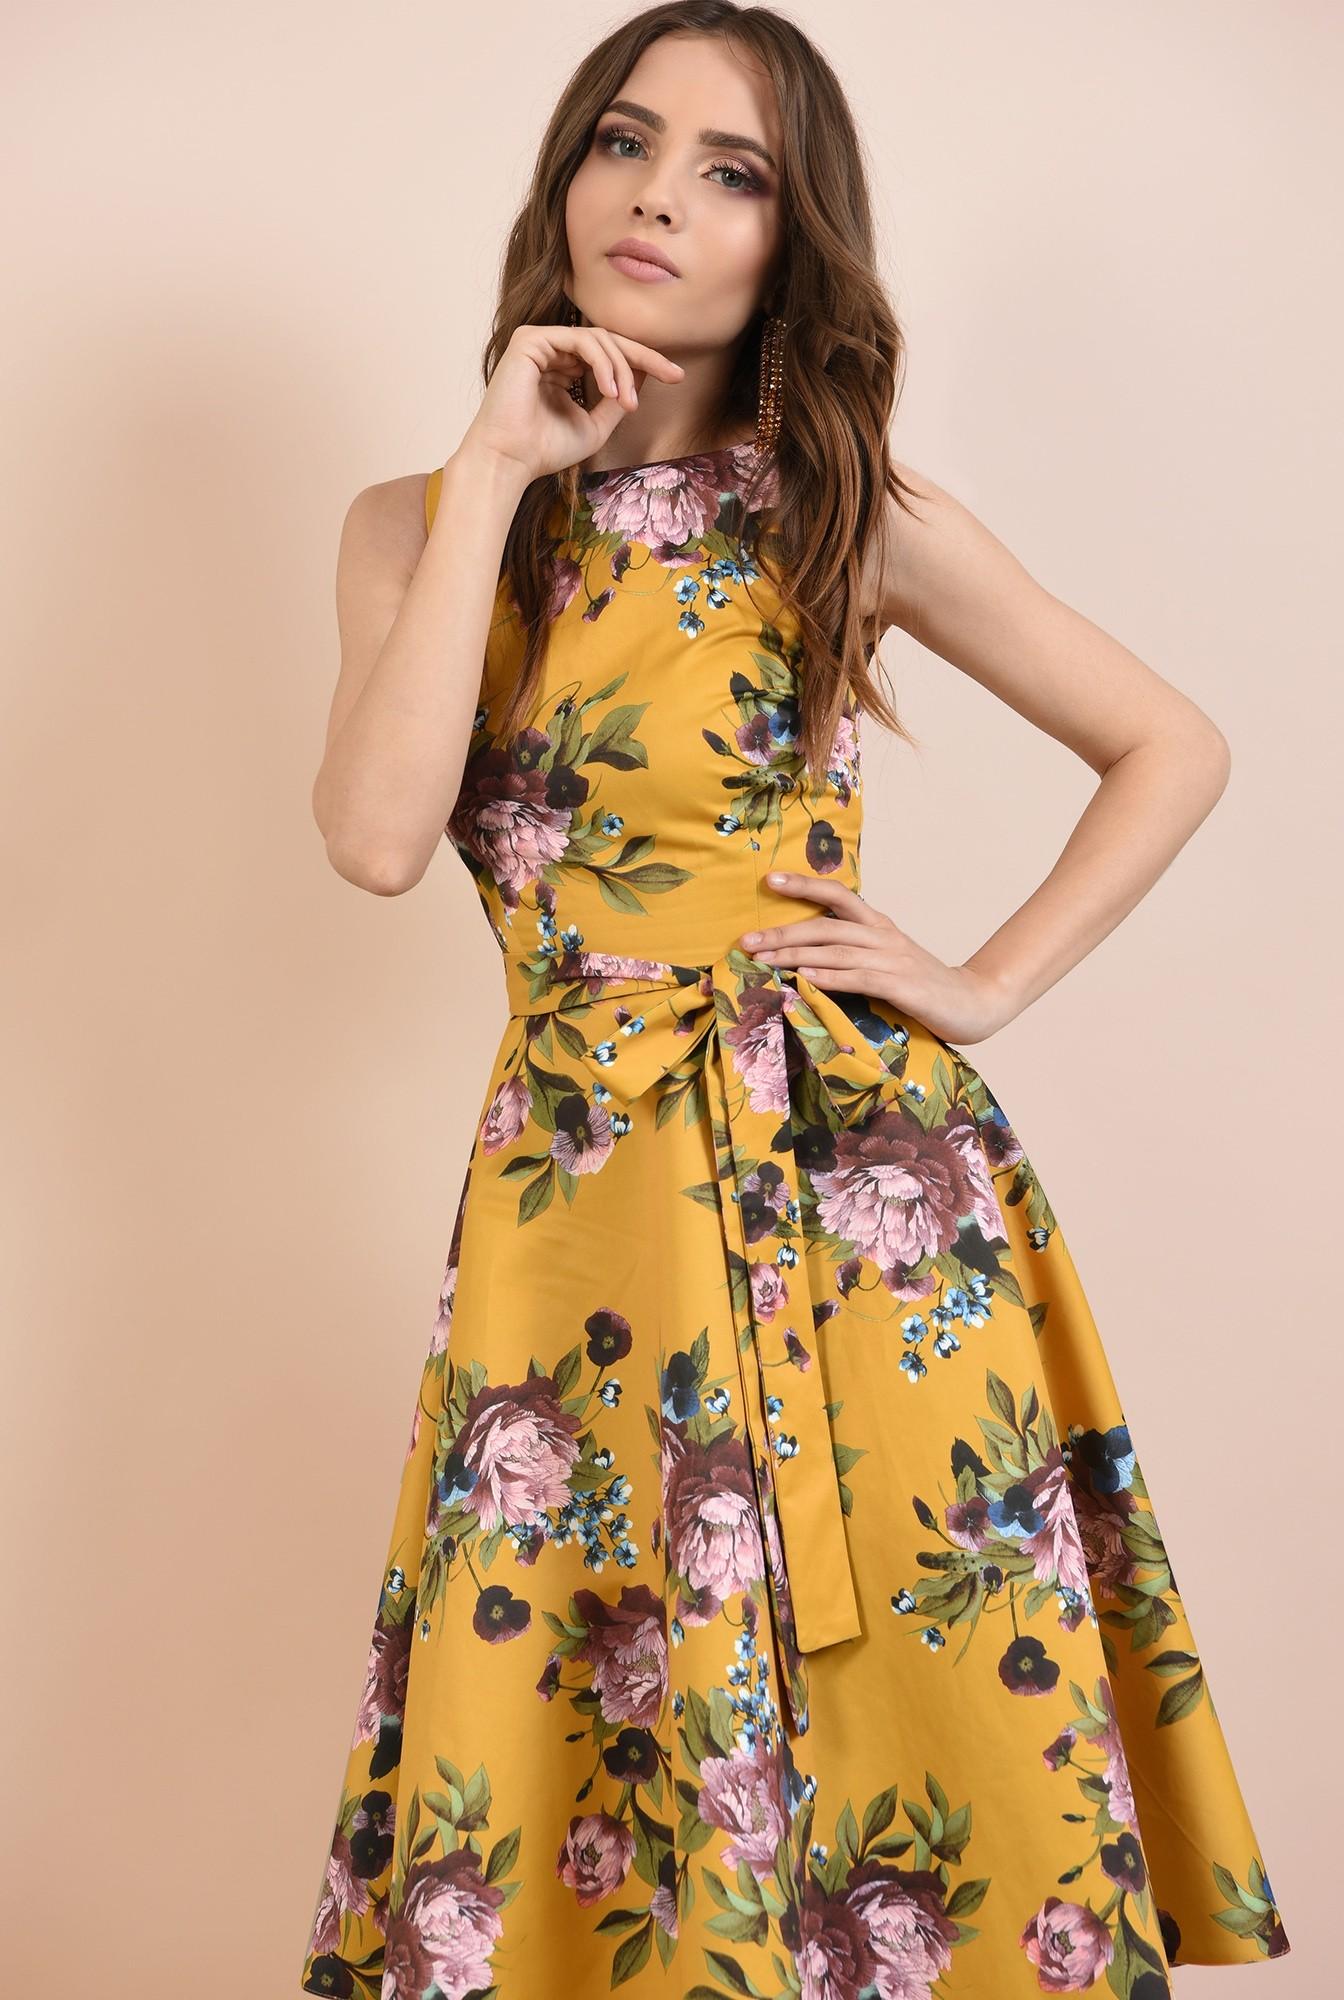 0 - rochie de seara, cu croi evazata, imprimeu floral, cordon cu funda la talie